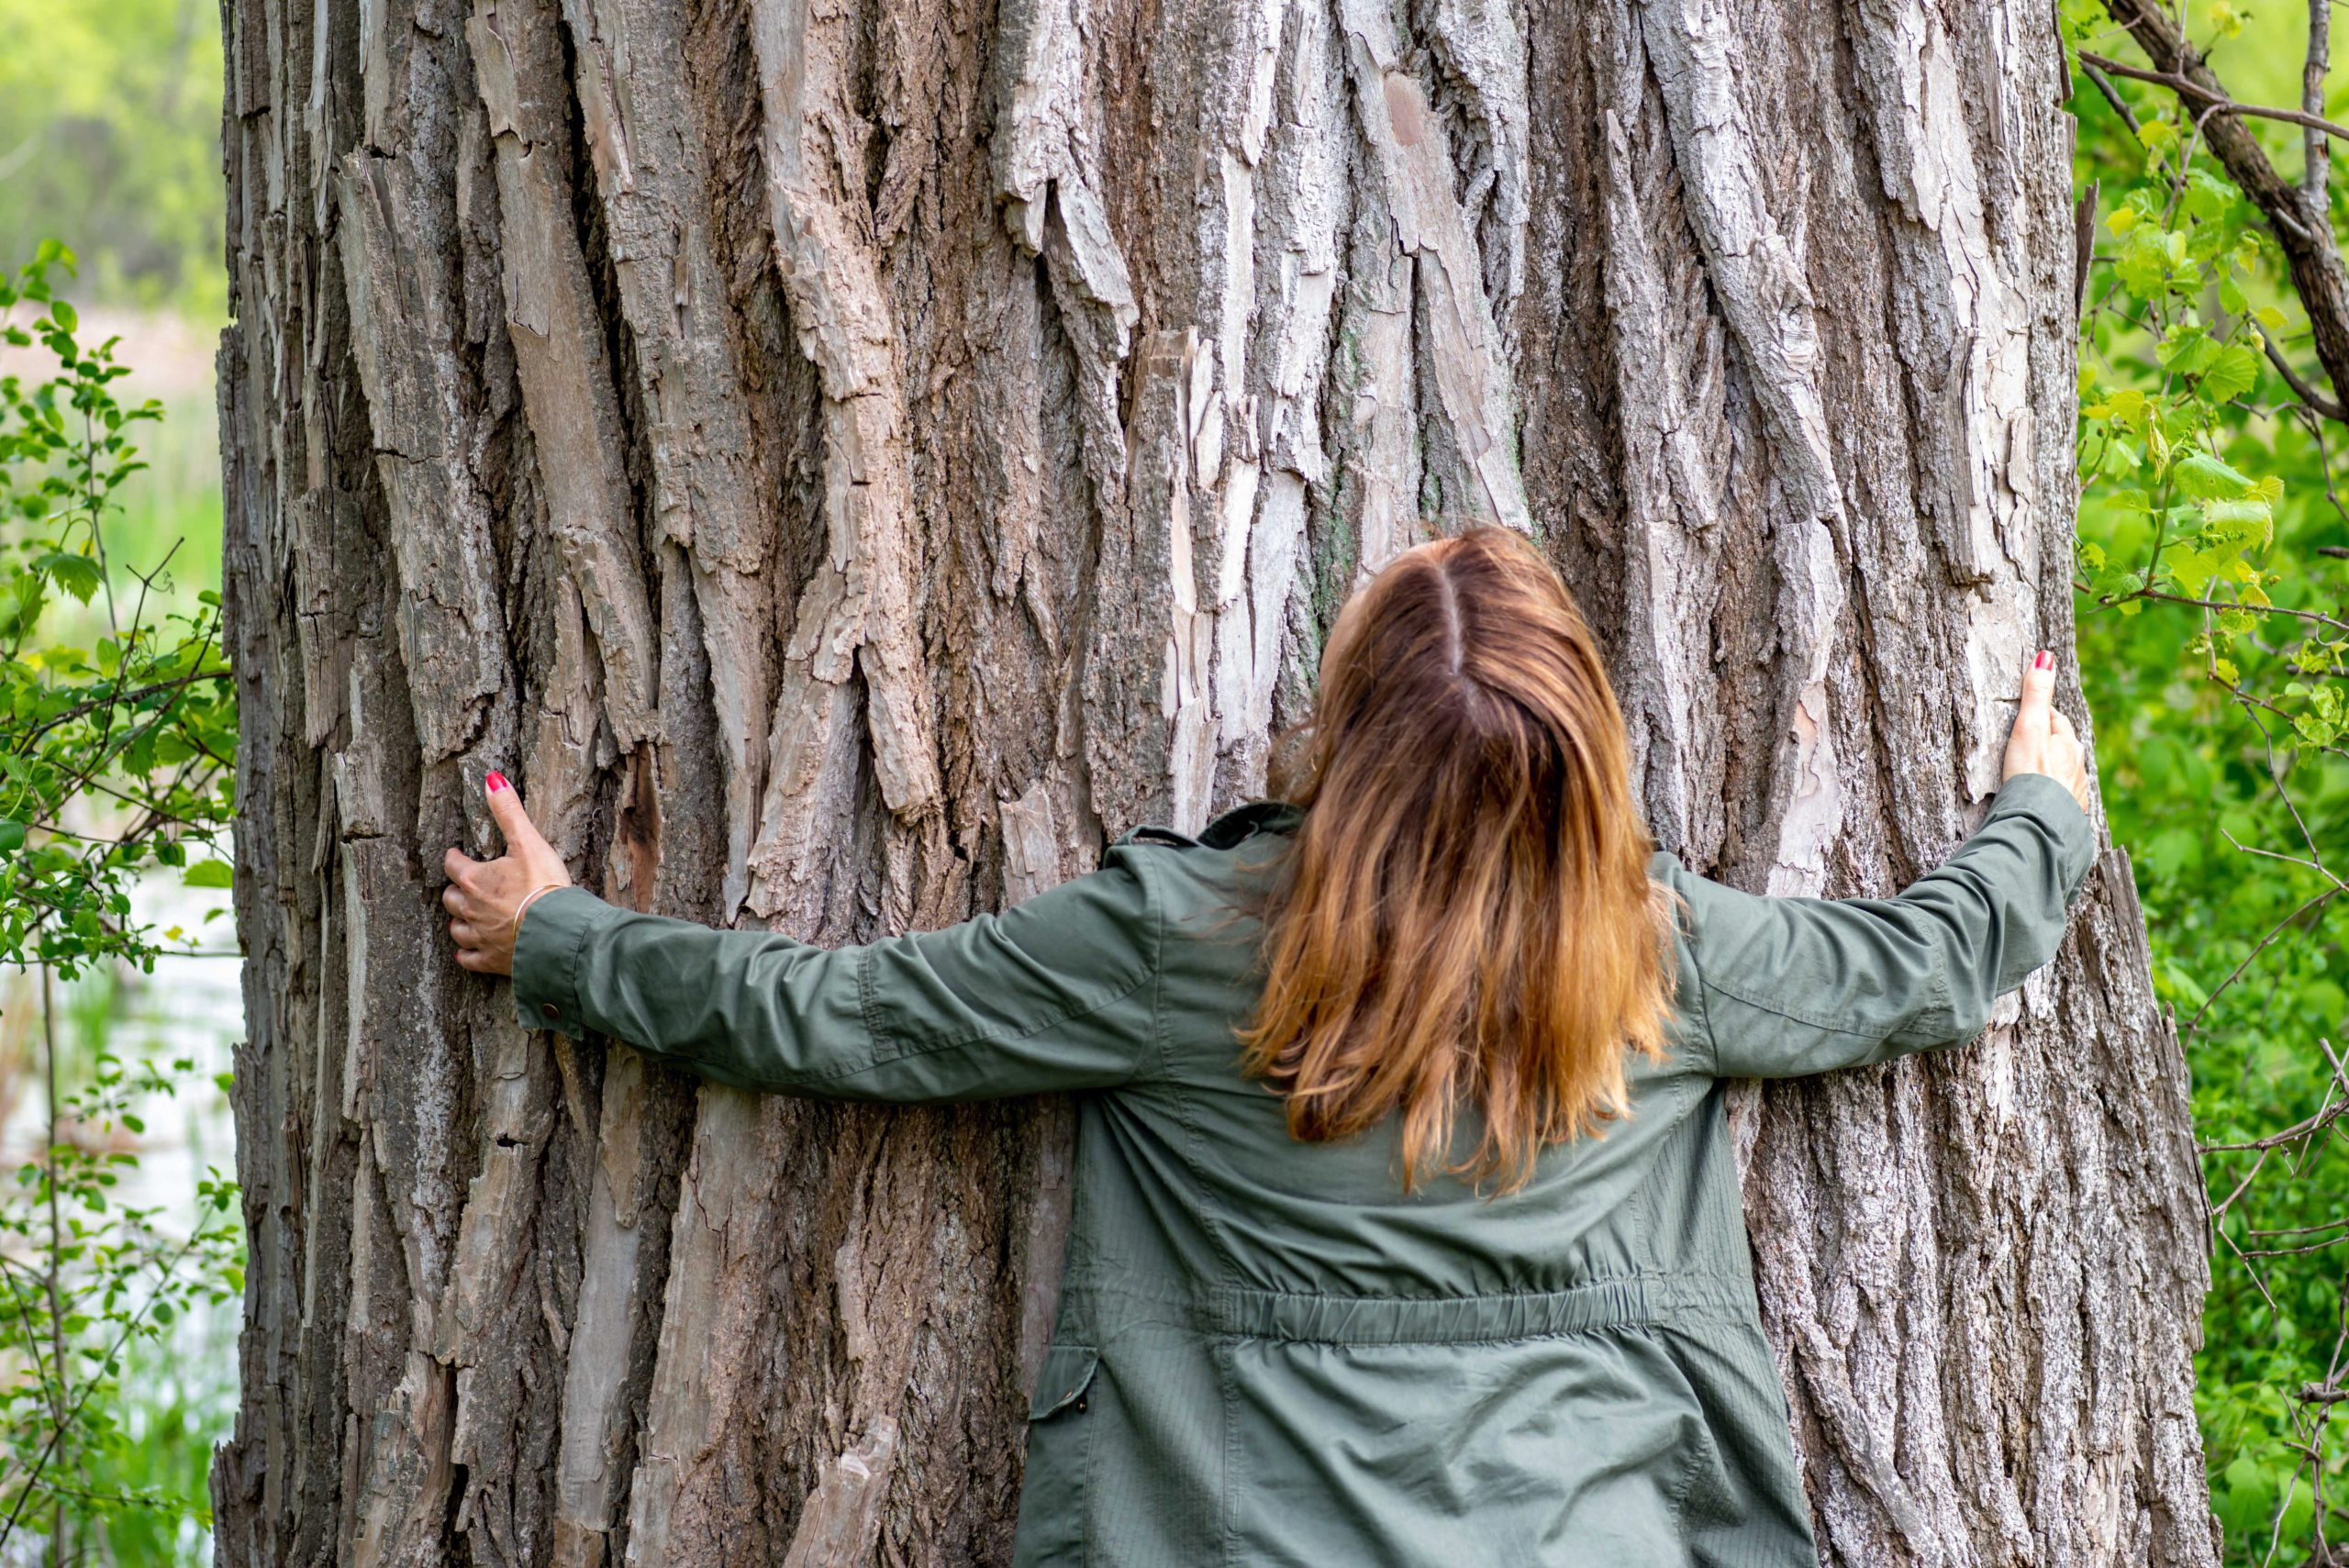 A woman hugs an enormous tree